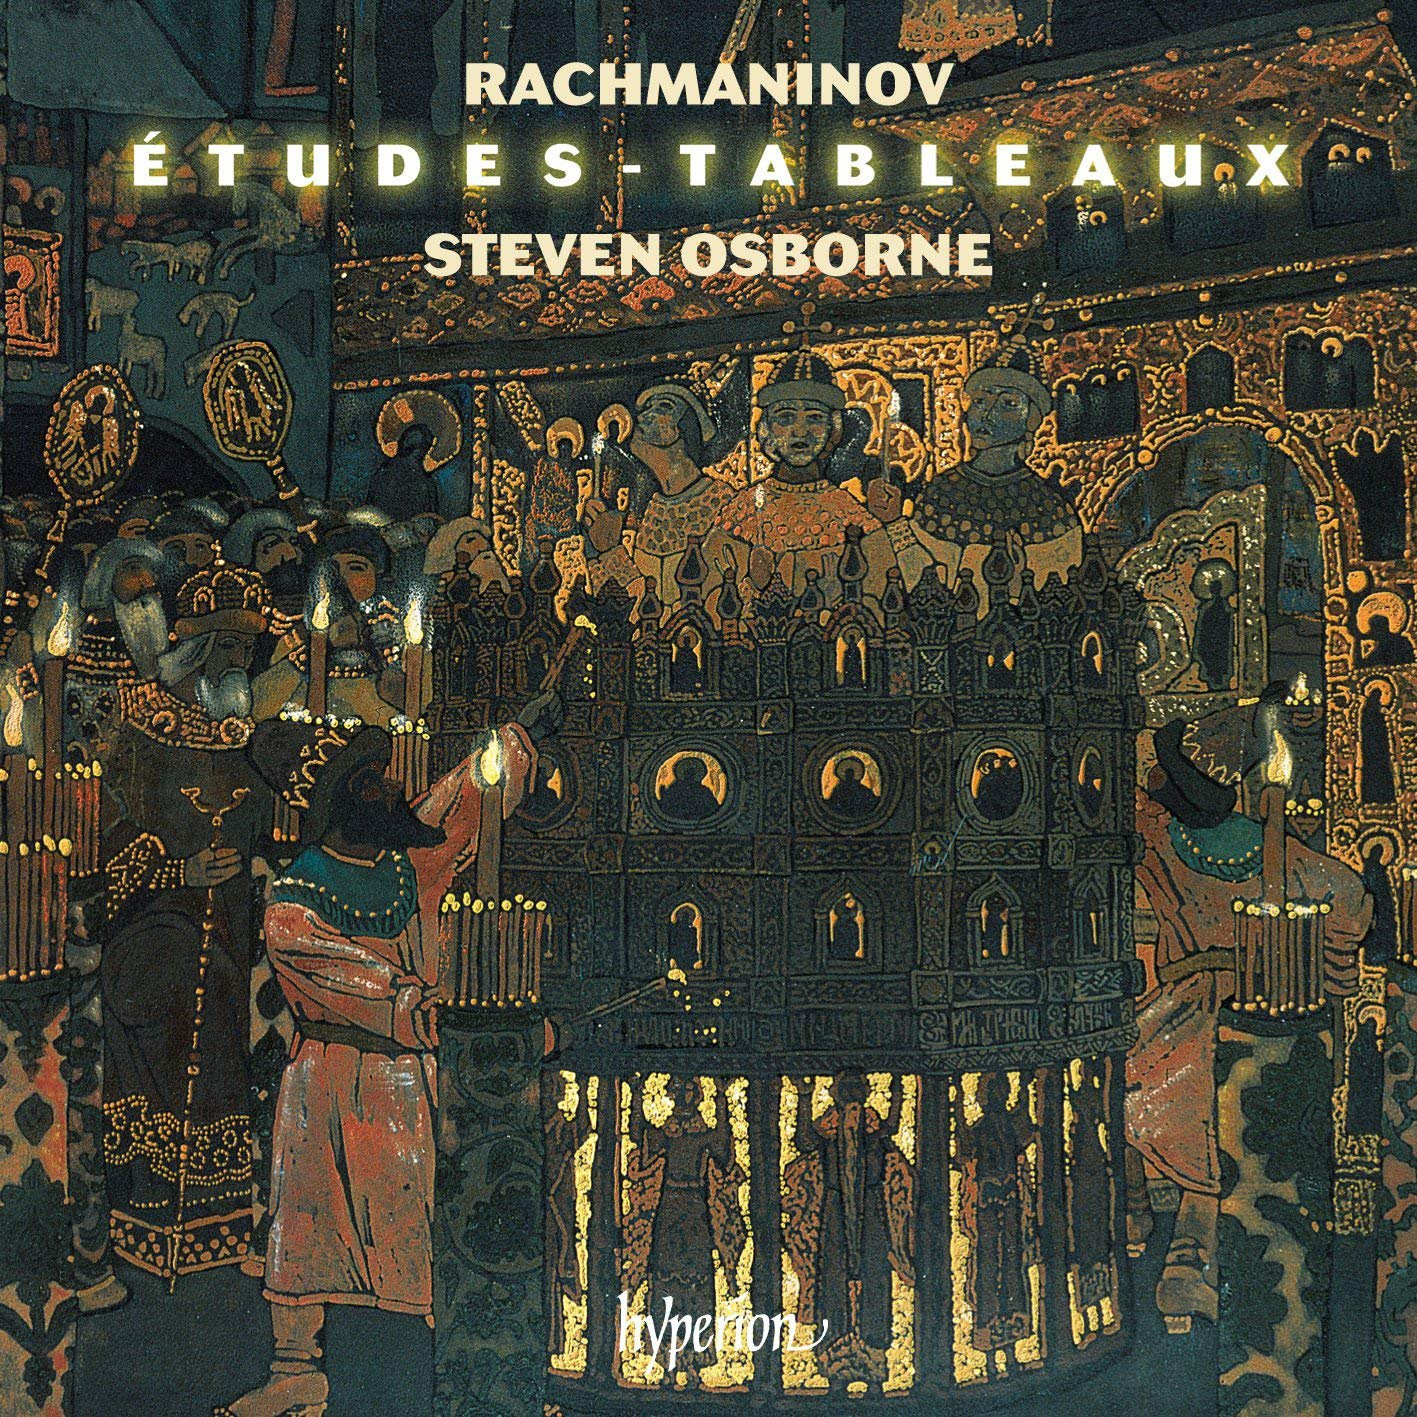 Rachmaninov: San Jose Mall Etudes-tableaux Opp.33 Max 64% OFF 39